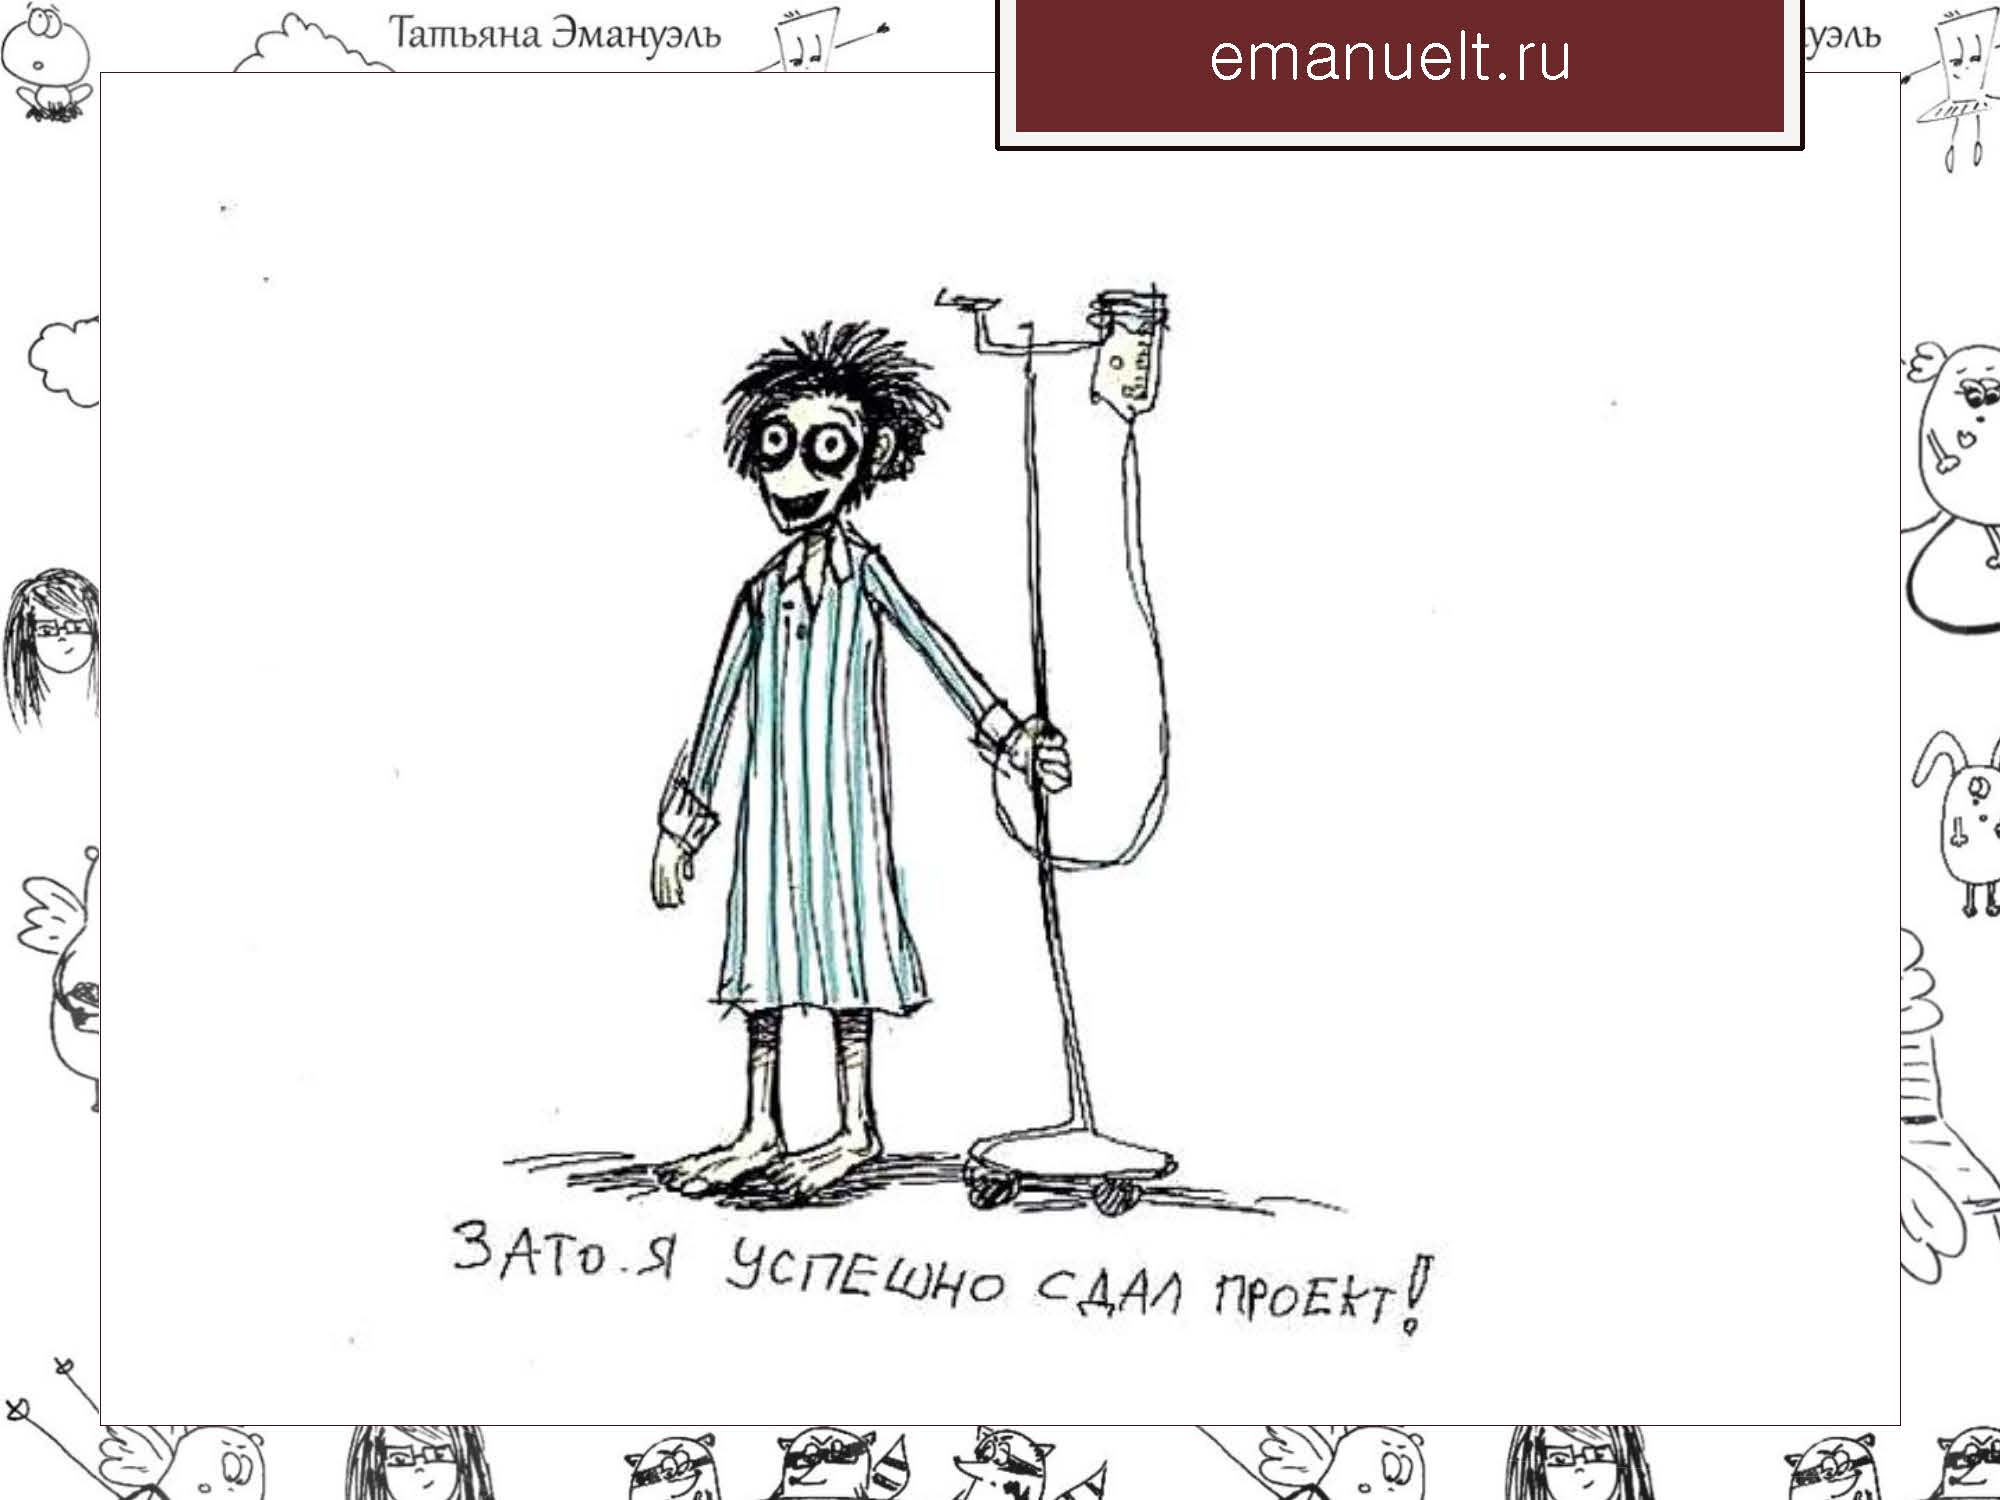 06 февраля эмануэль_Страница_120